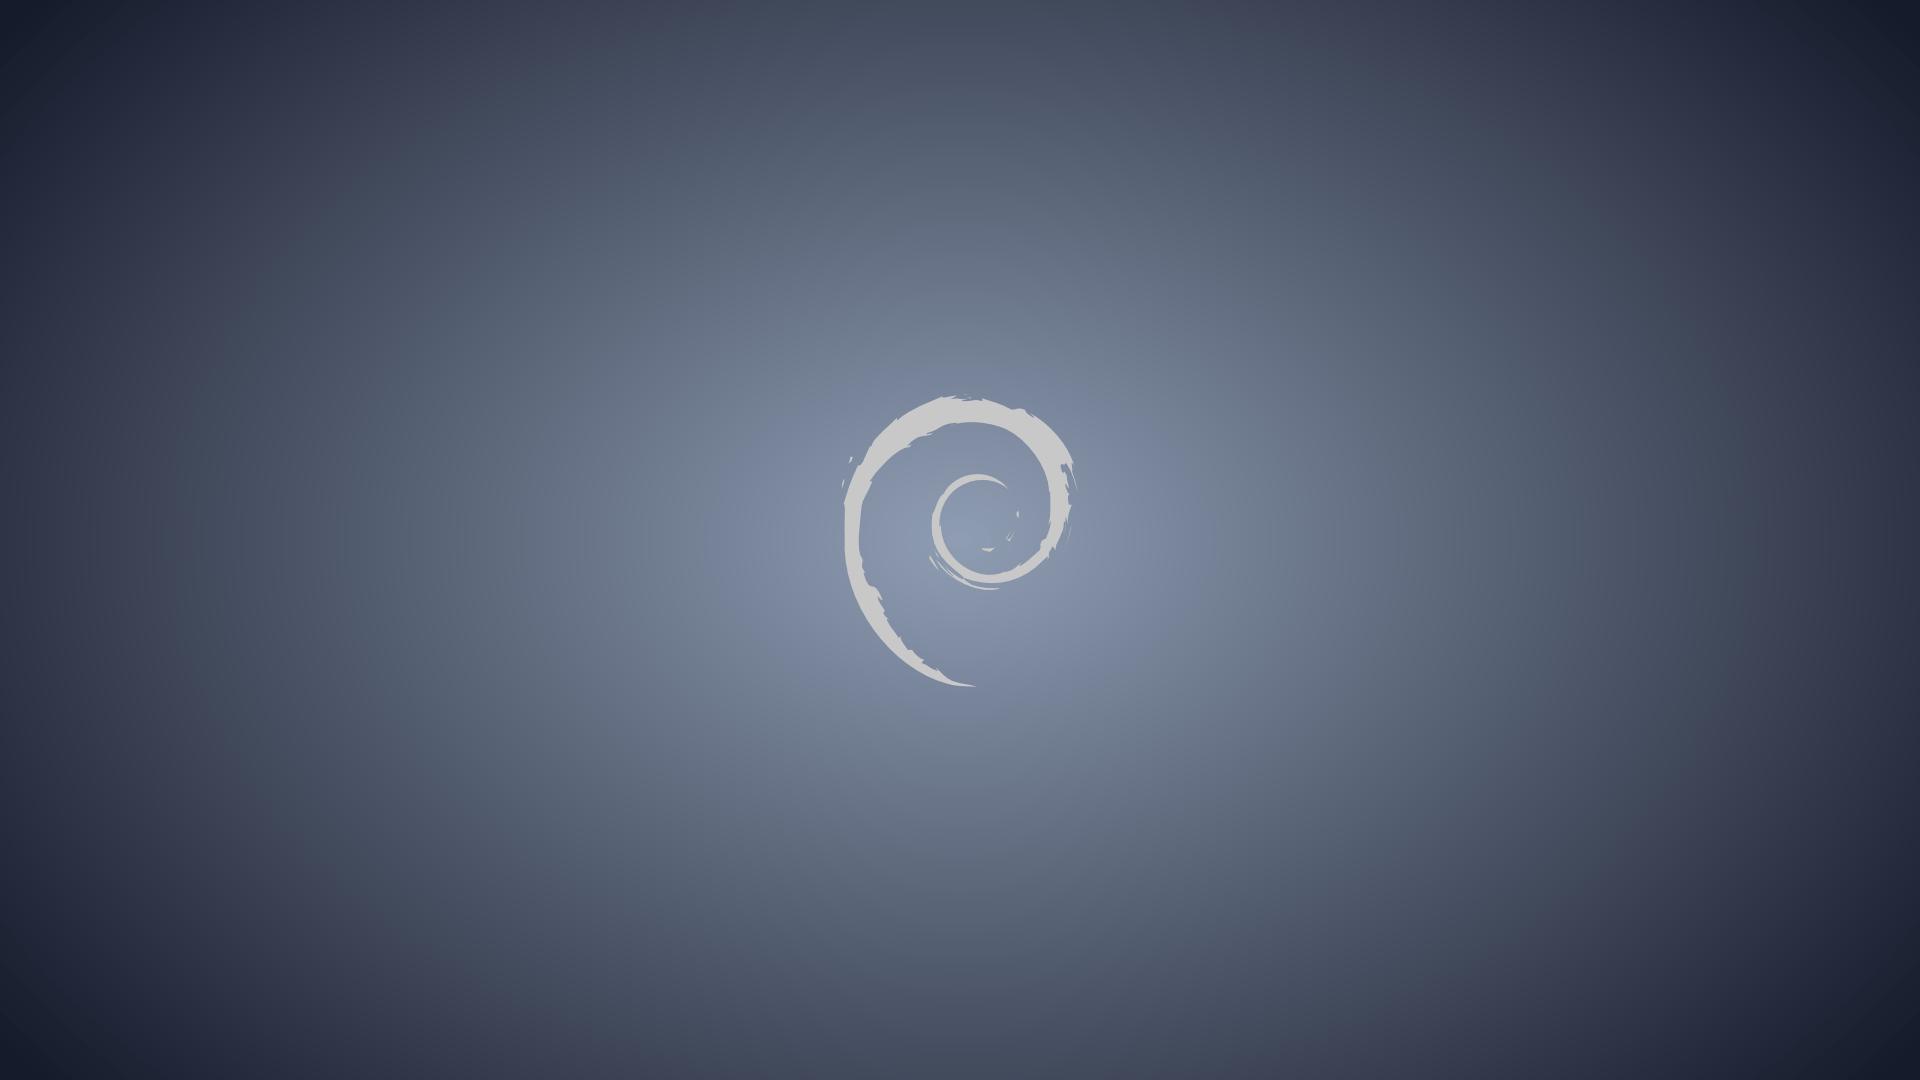 40 Debian Wallpapers   Download at WallpaperBro 1920x1080